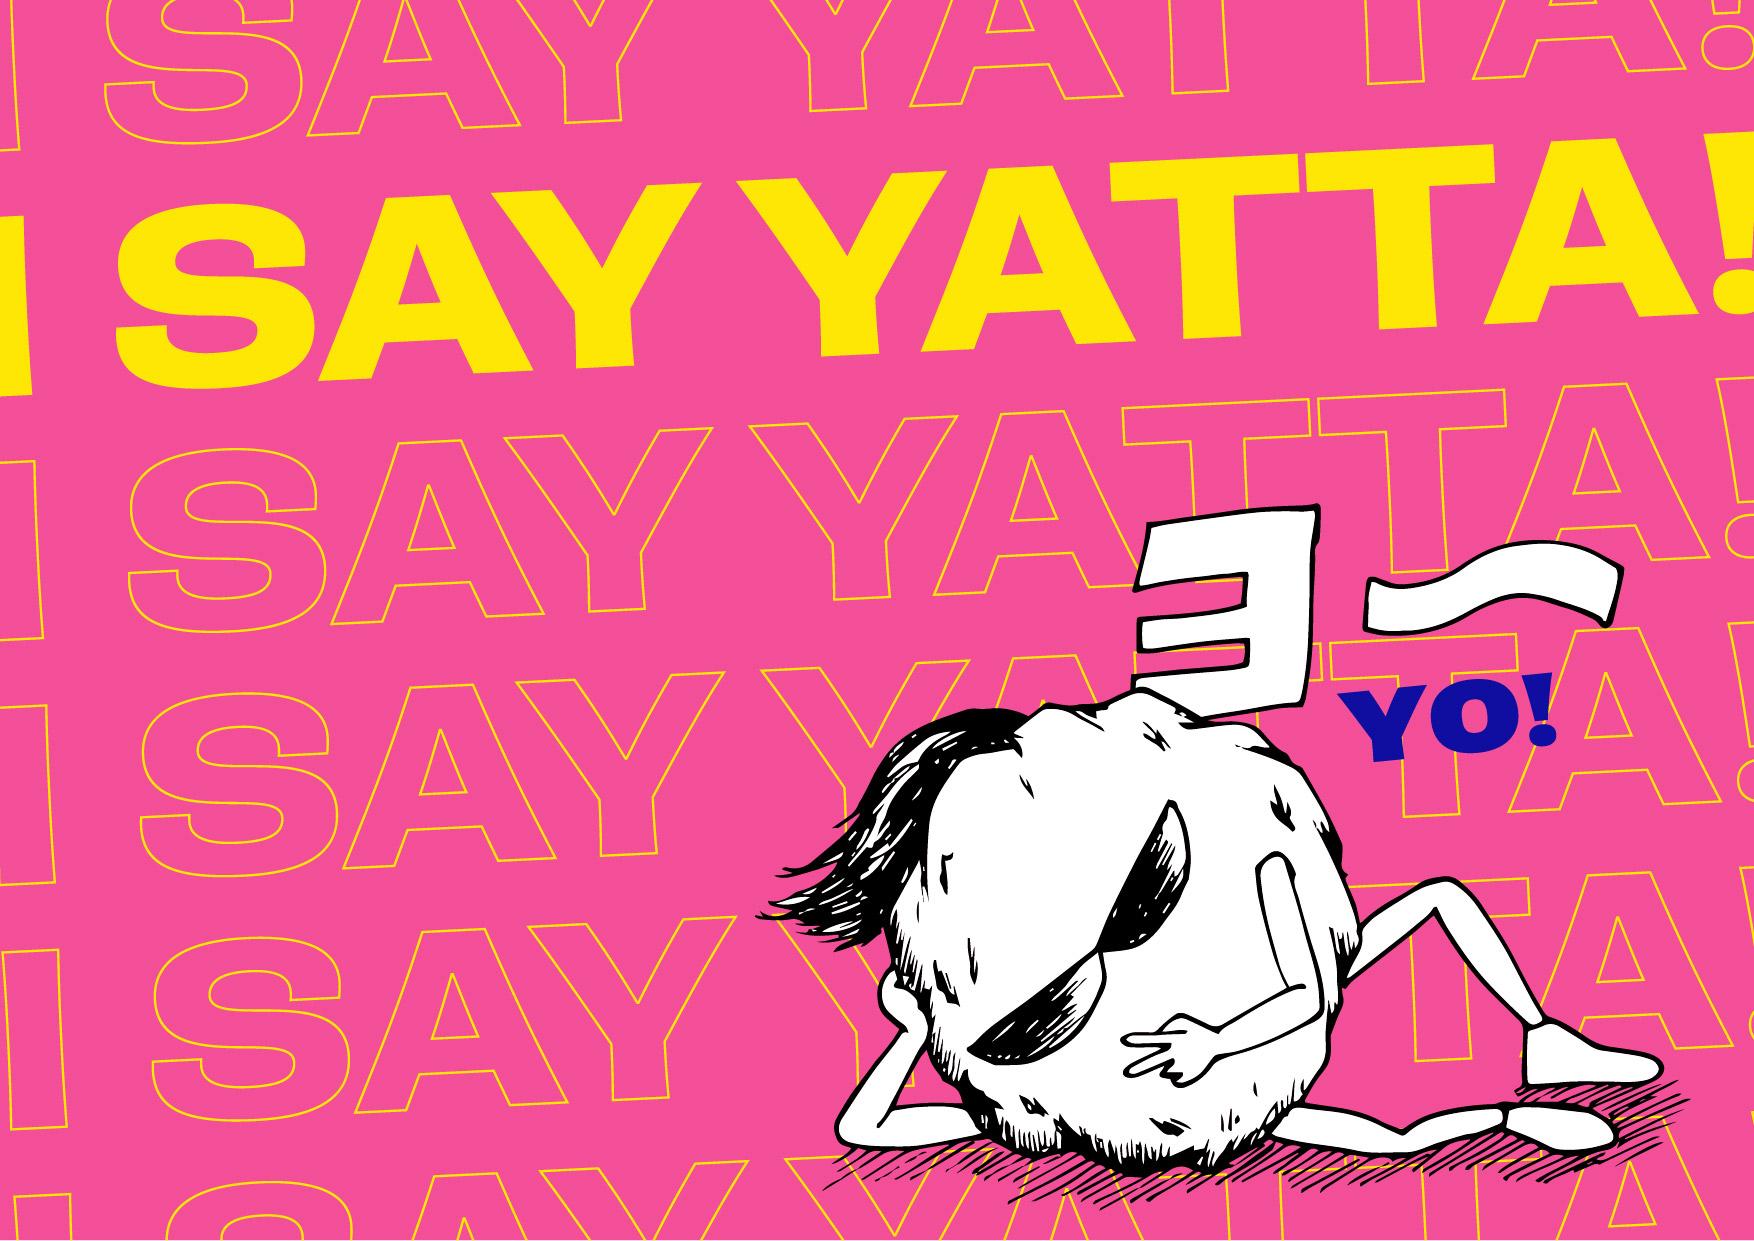 I Say Yatta! Rebranding